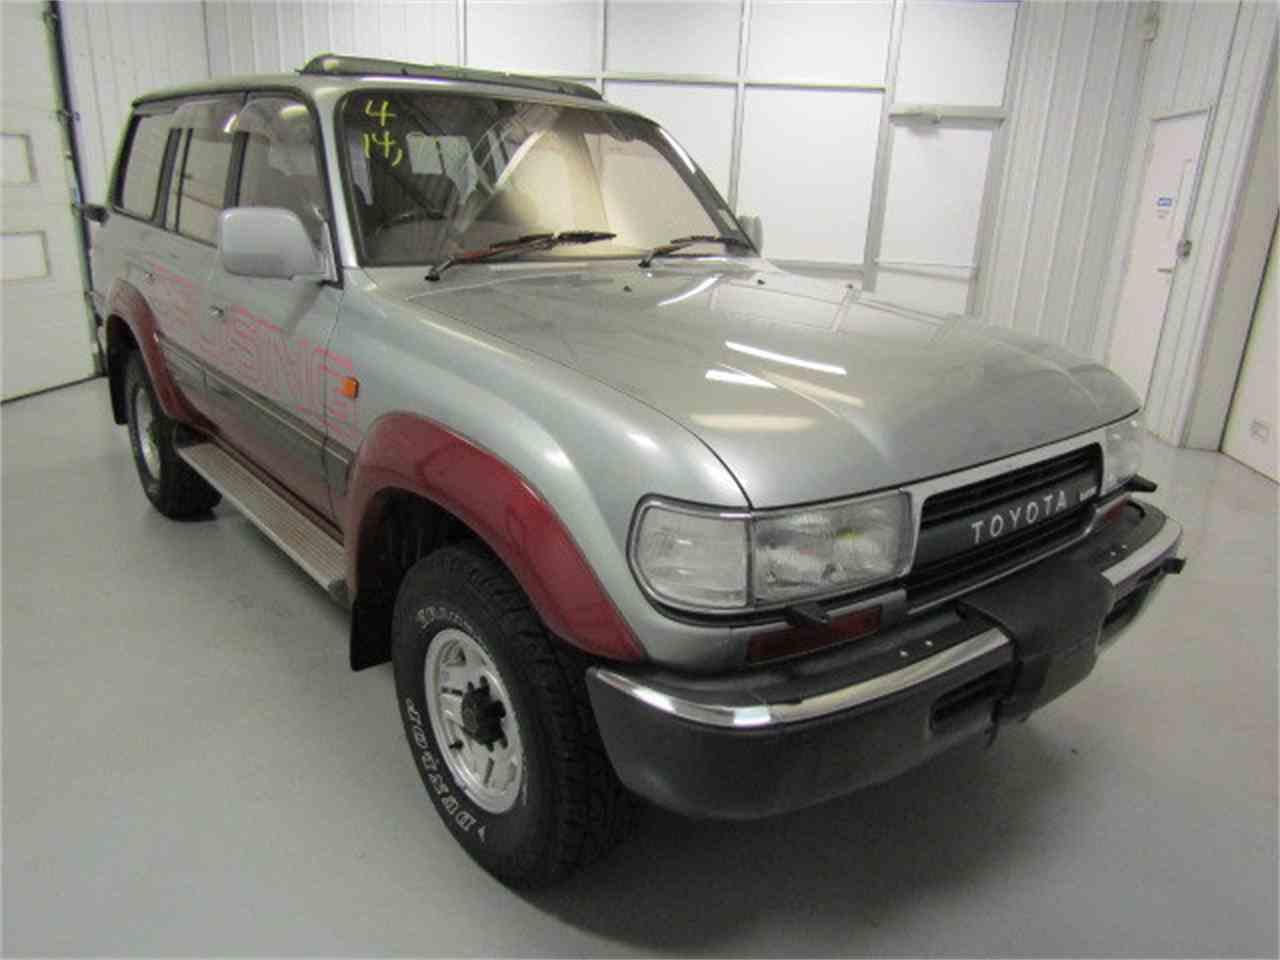 1990 Toyota Land Cruiser FJ for Sale - CC-1003217